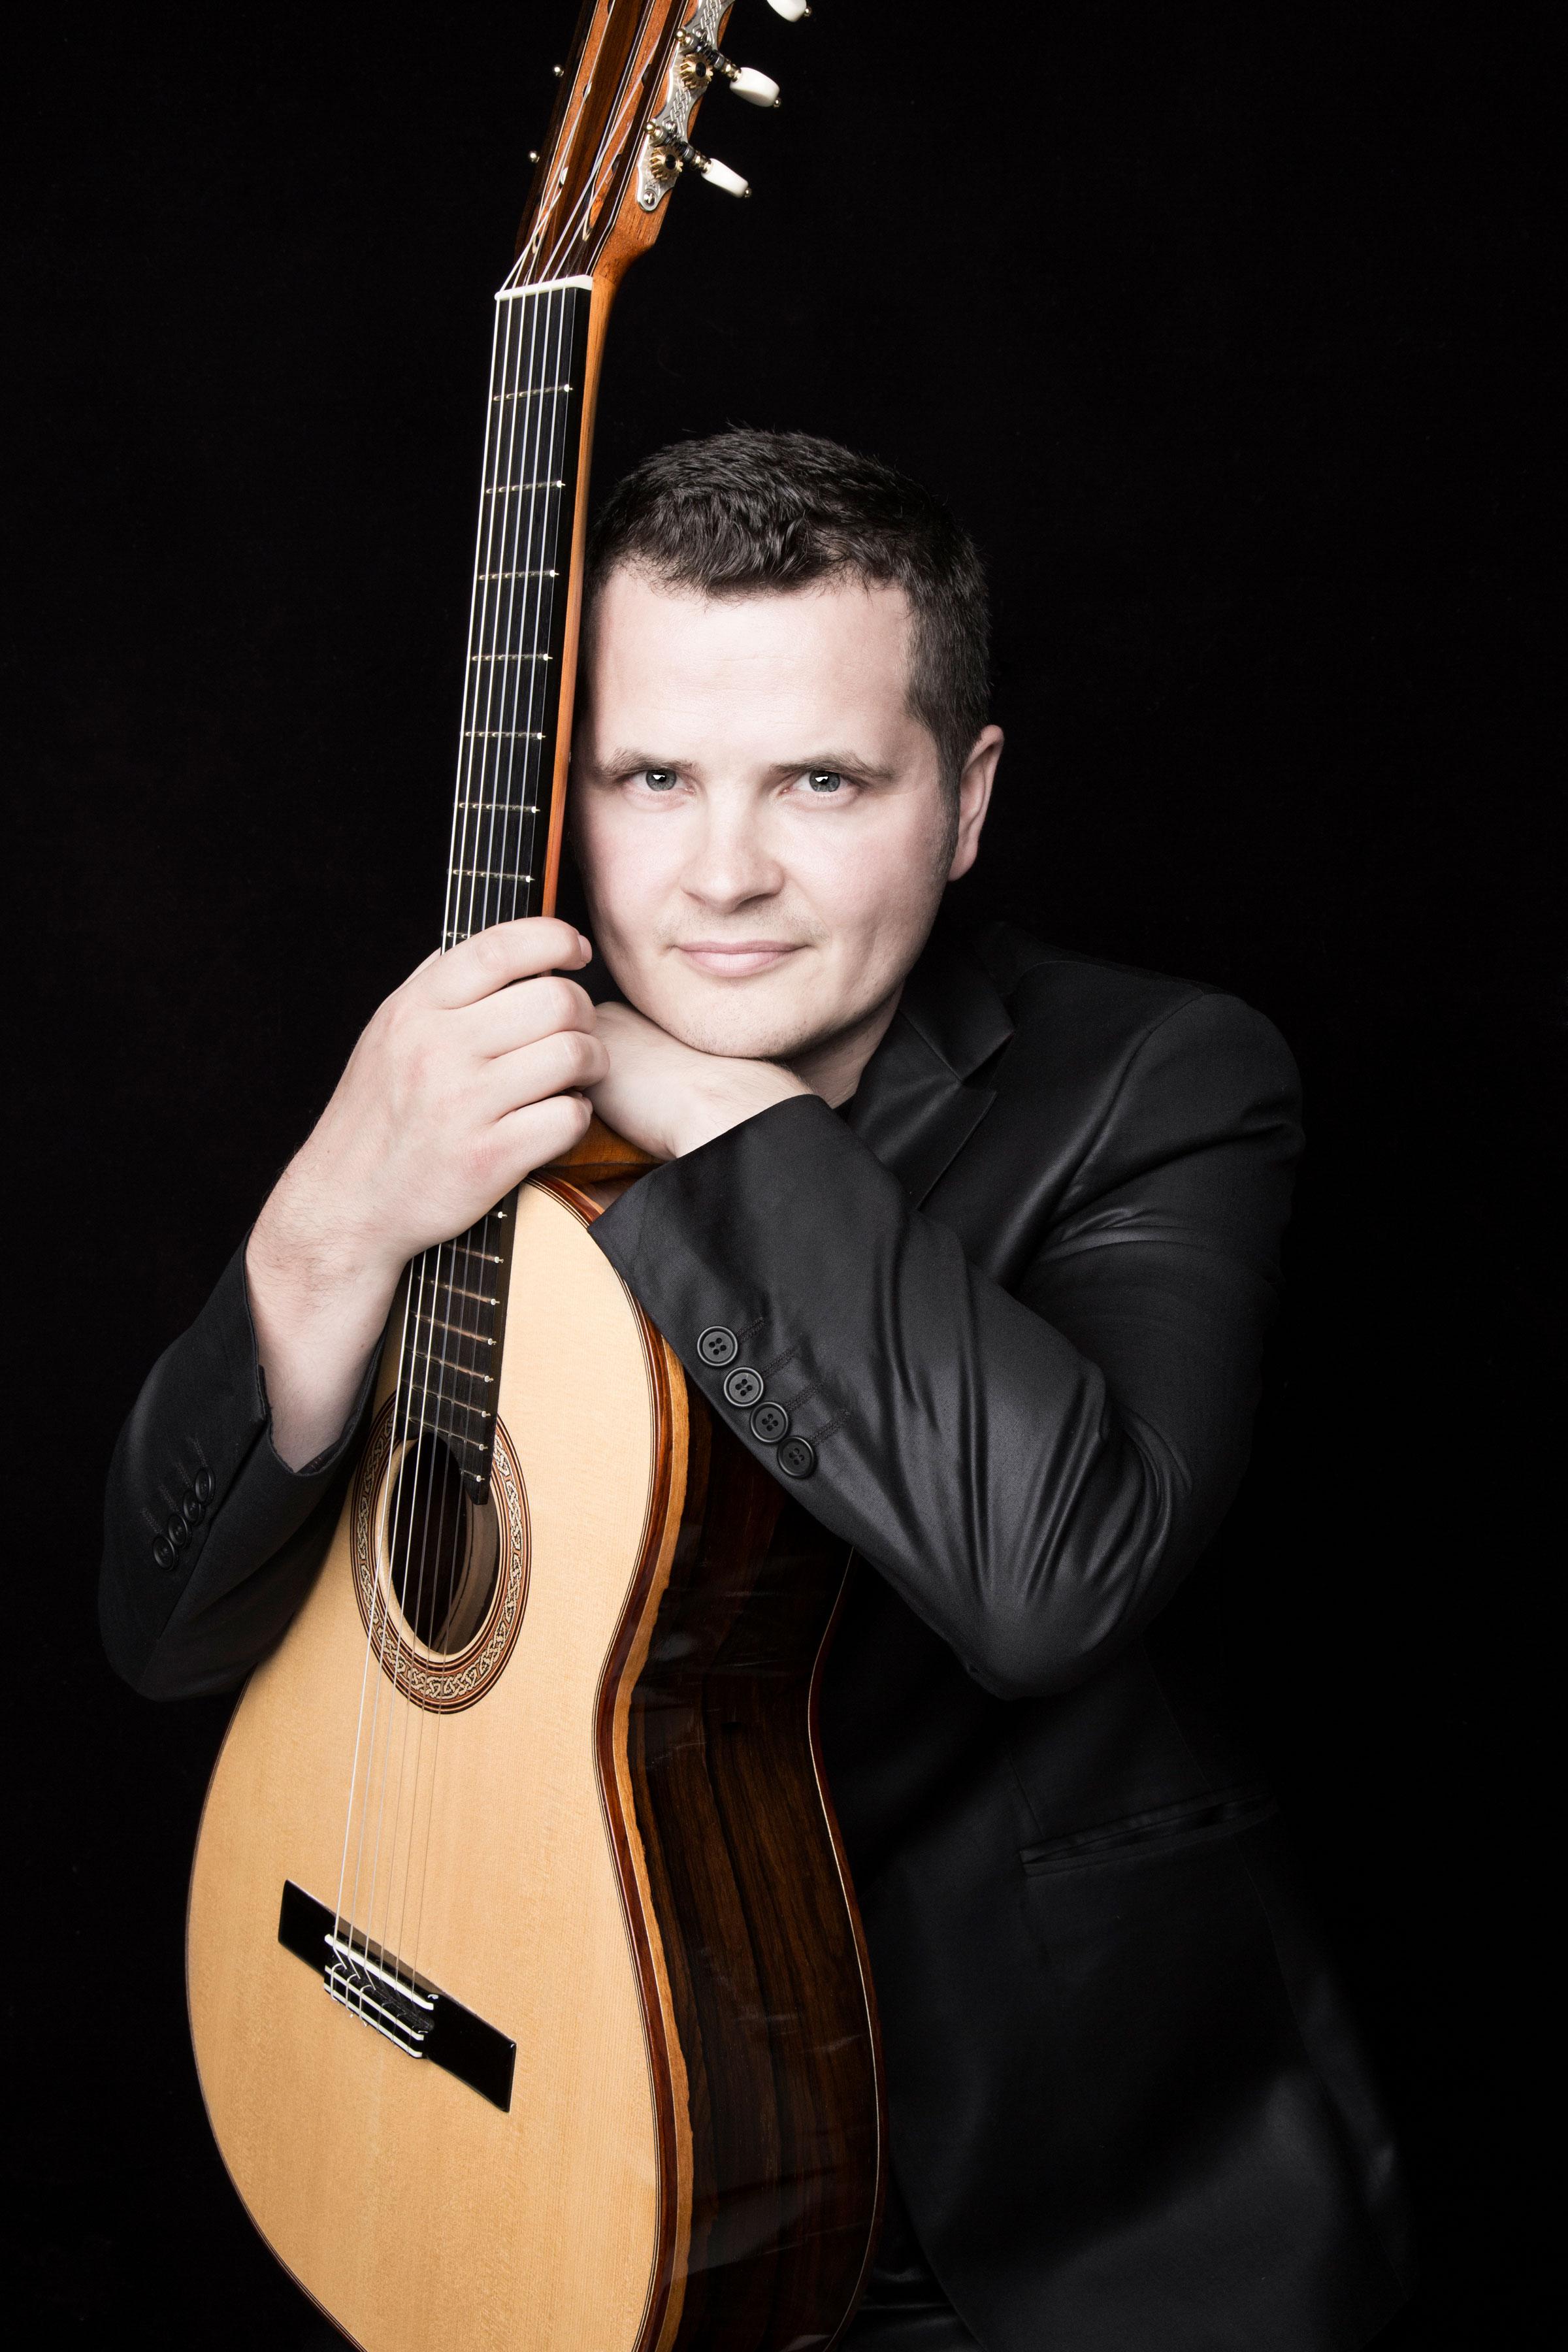 Alec O'Leary guitar